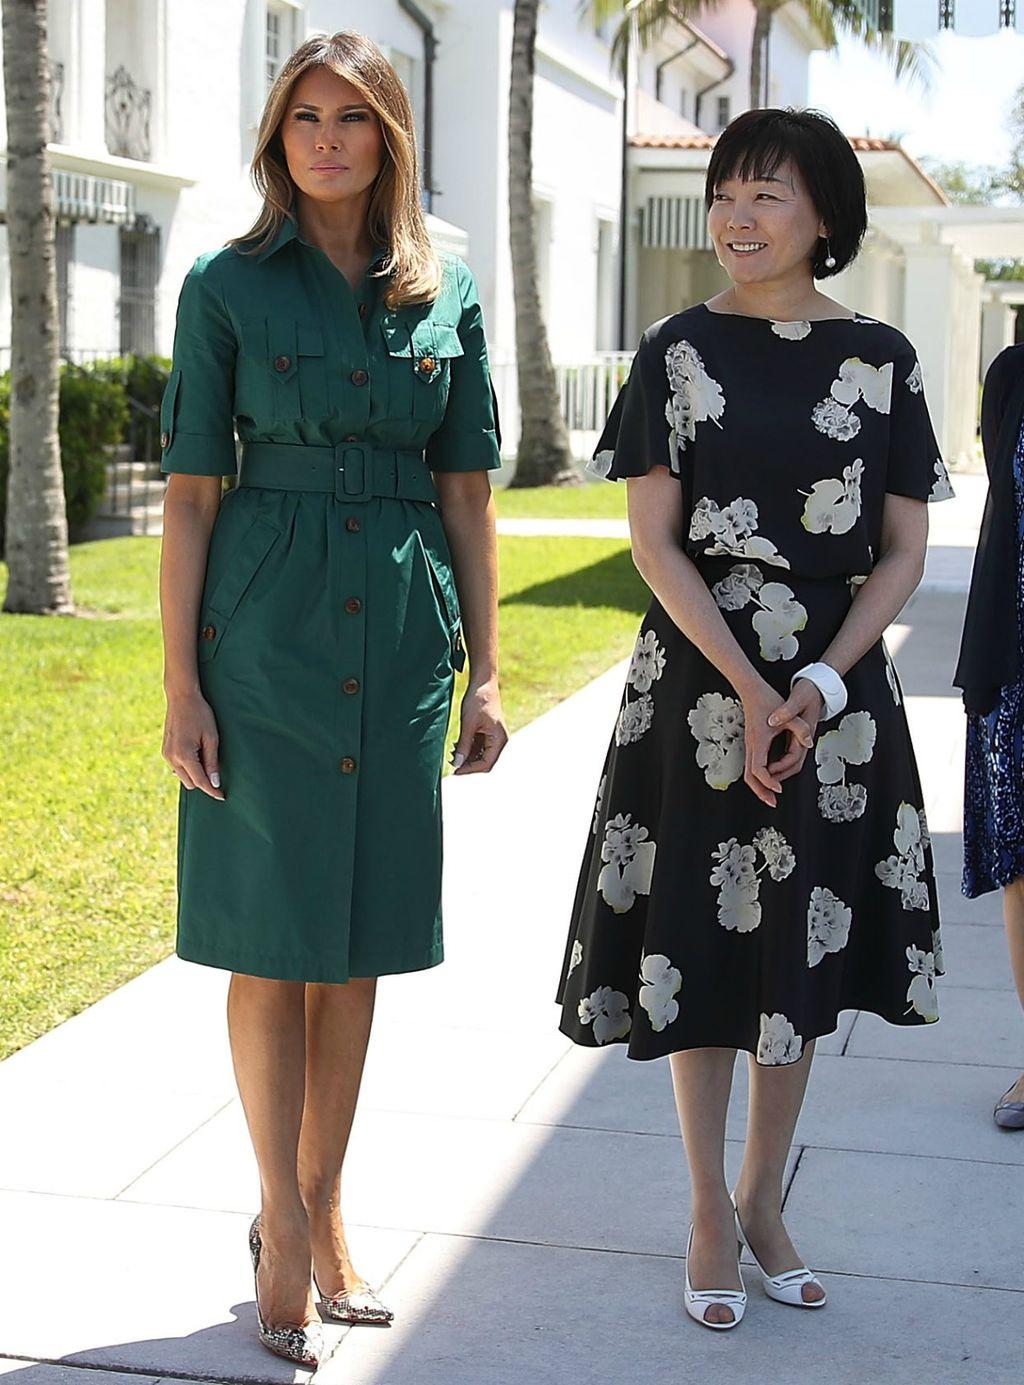 Melania i Akie prilikom posjeta muzeju u Palm Beachu